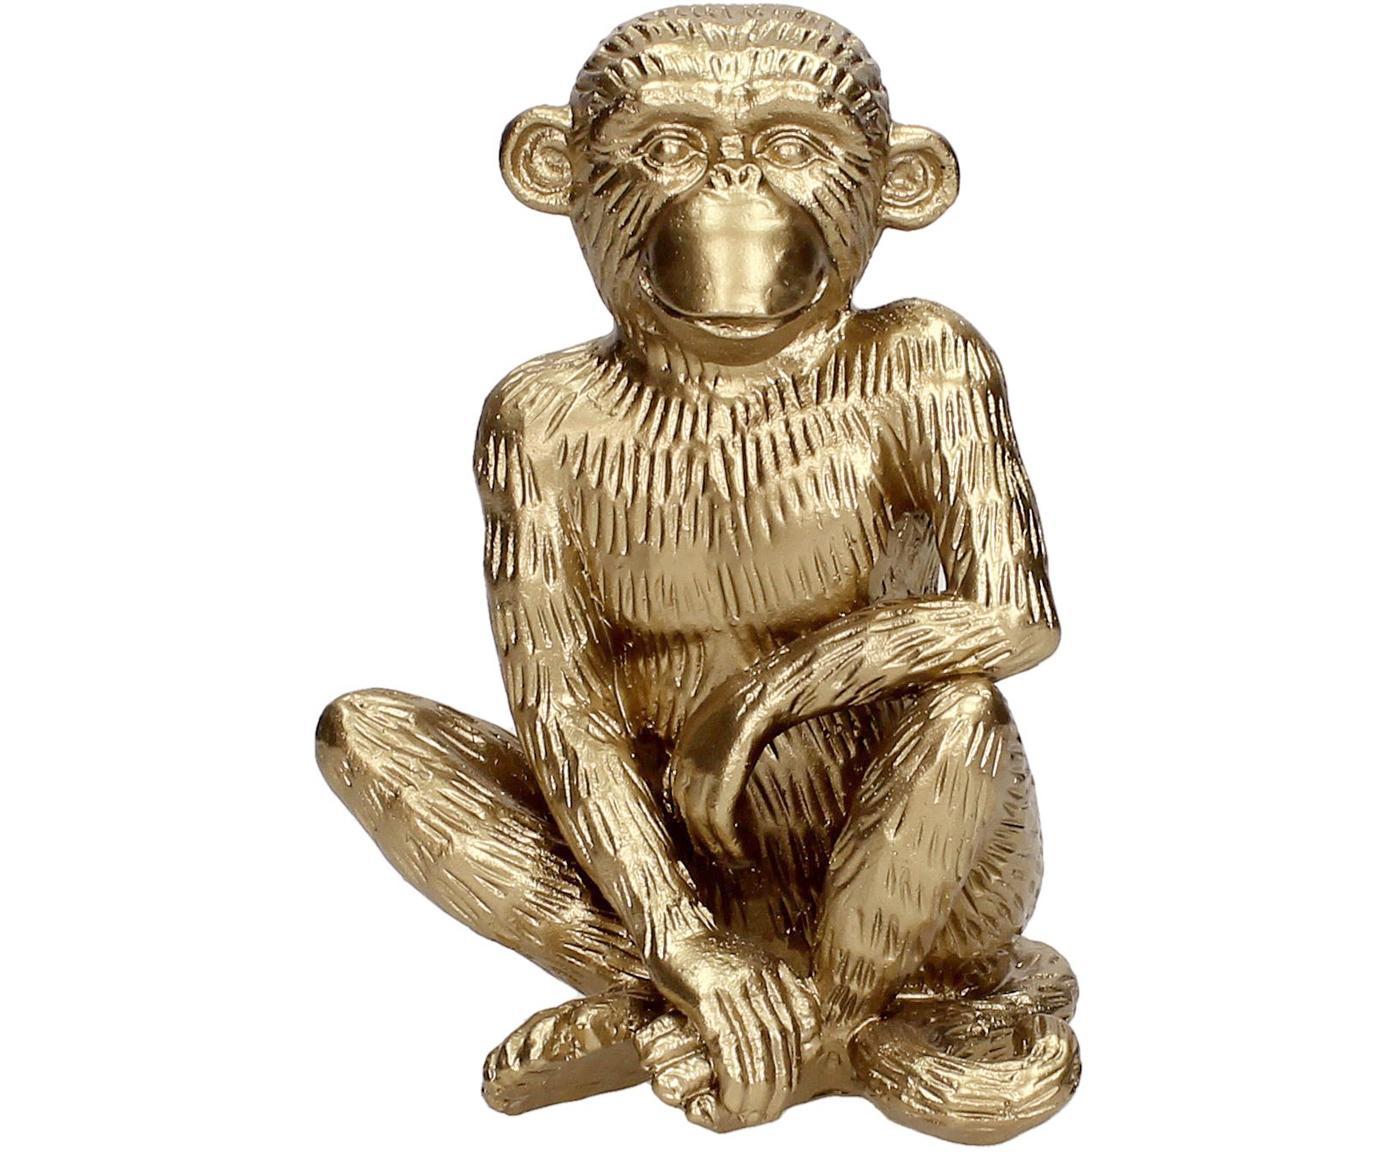 Deko-Objekt Monkey, Polyresin, Goldfarben, 12 x 15 cm